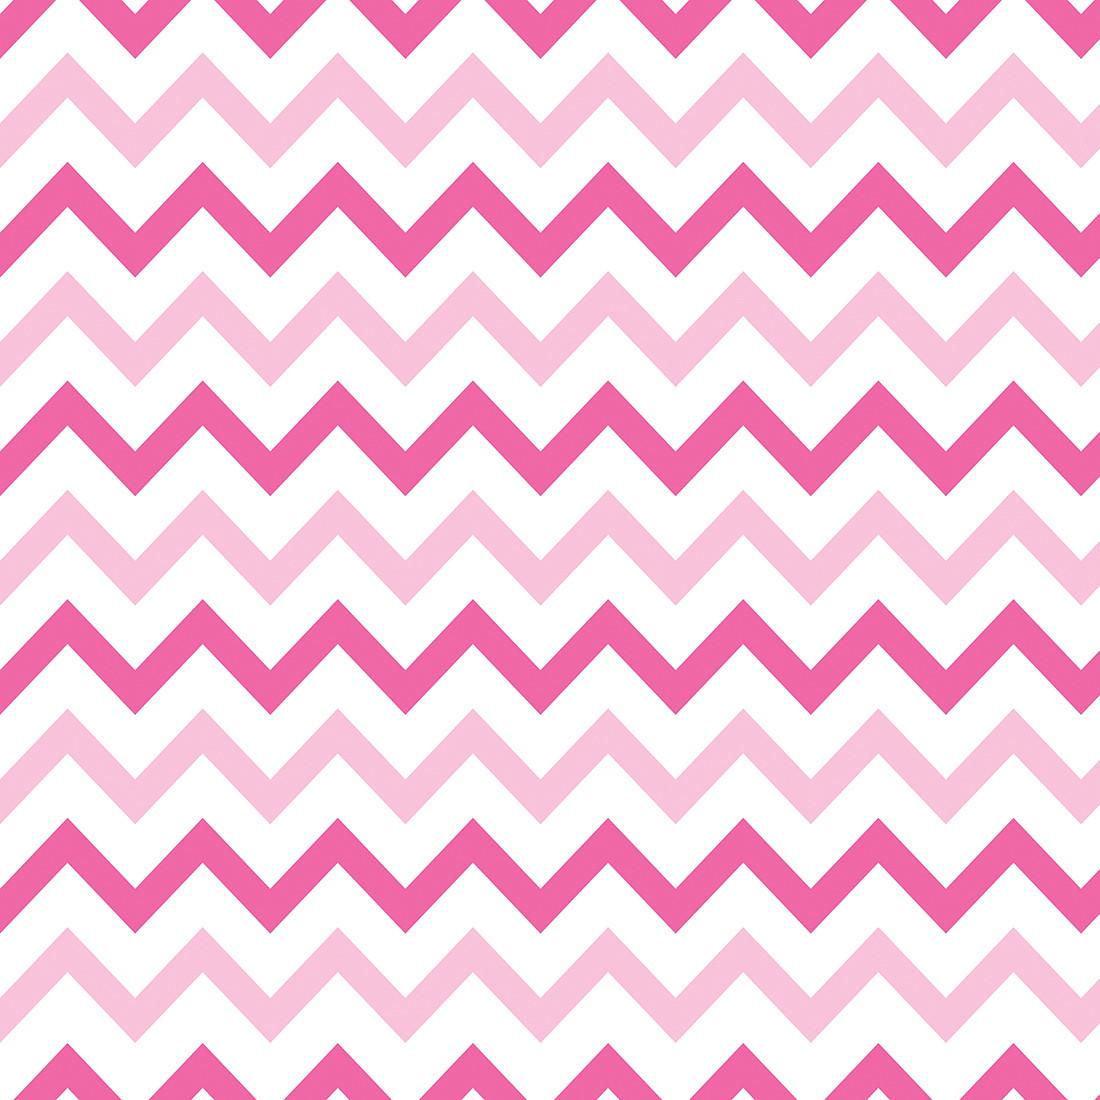 5a083b2df Papel de Parede Chevron Rosa bebe e Pink no Elo7